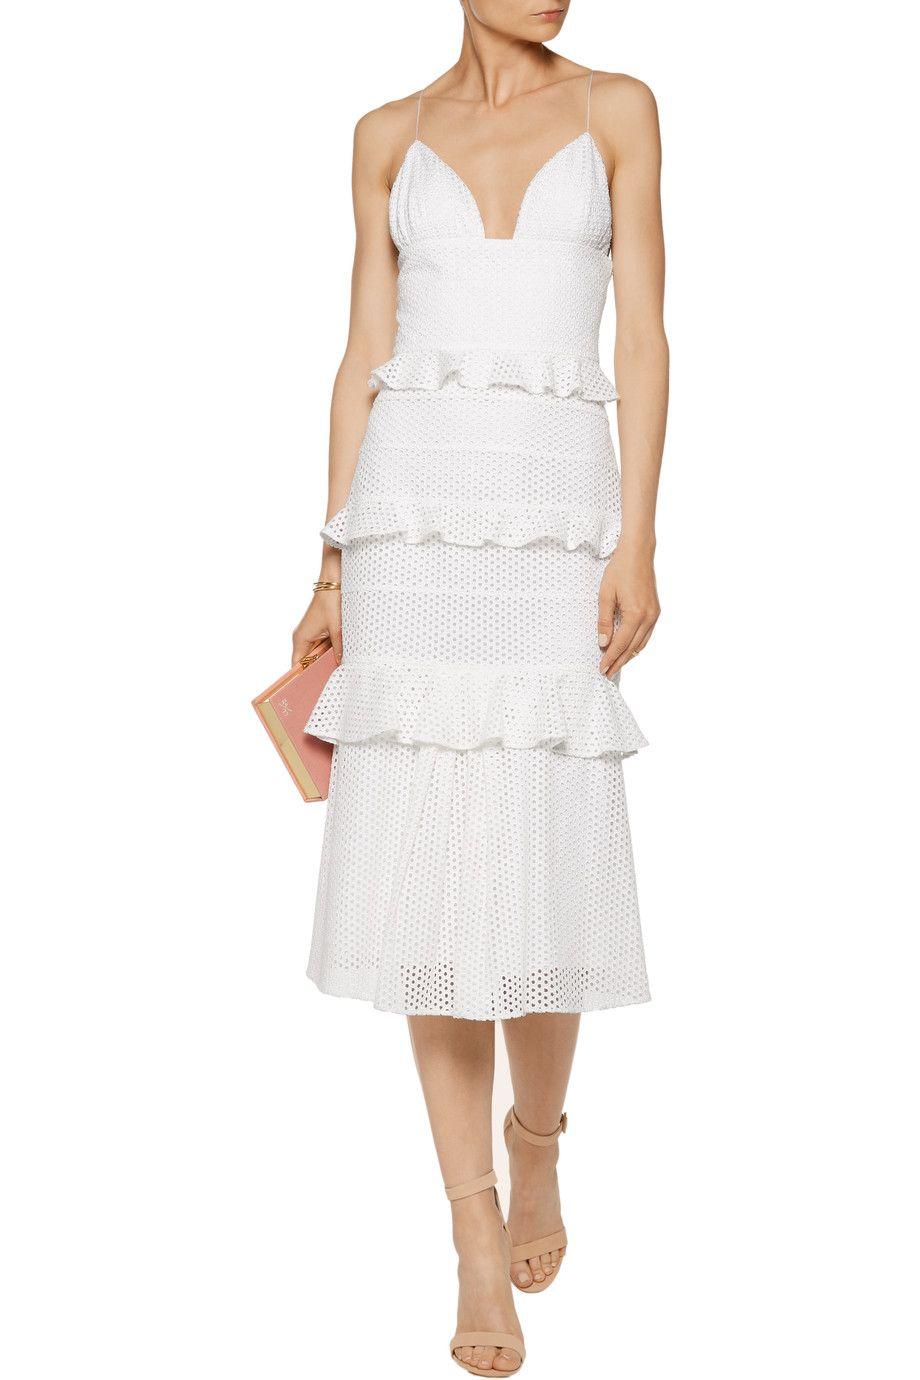 Shop on-sale Cushnie et Ochs Sofia tiered broderie anglaise cotton midi  dress. Browse